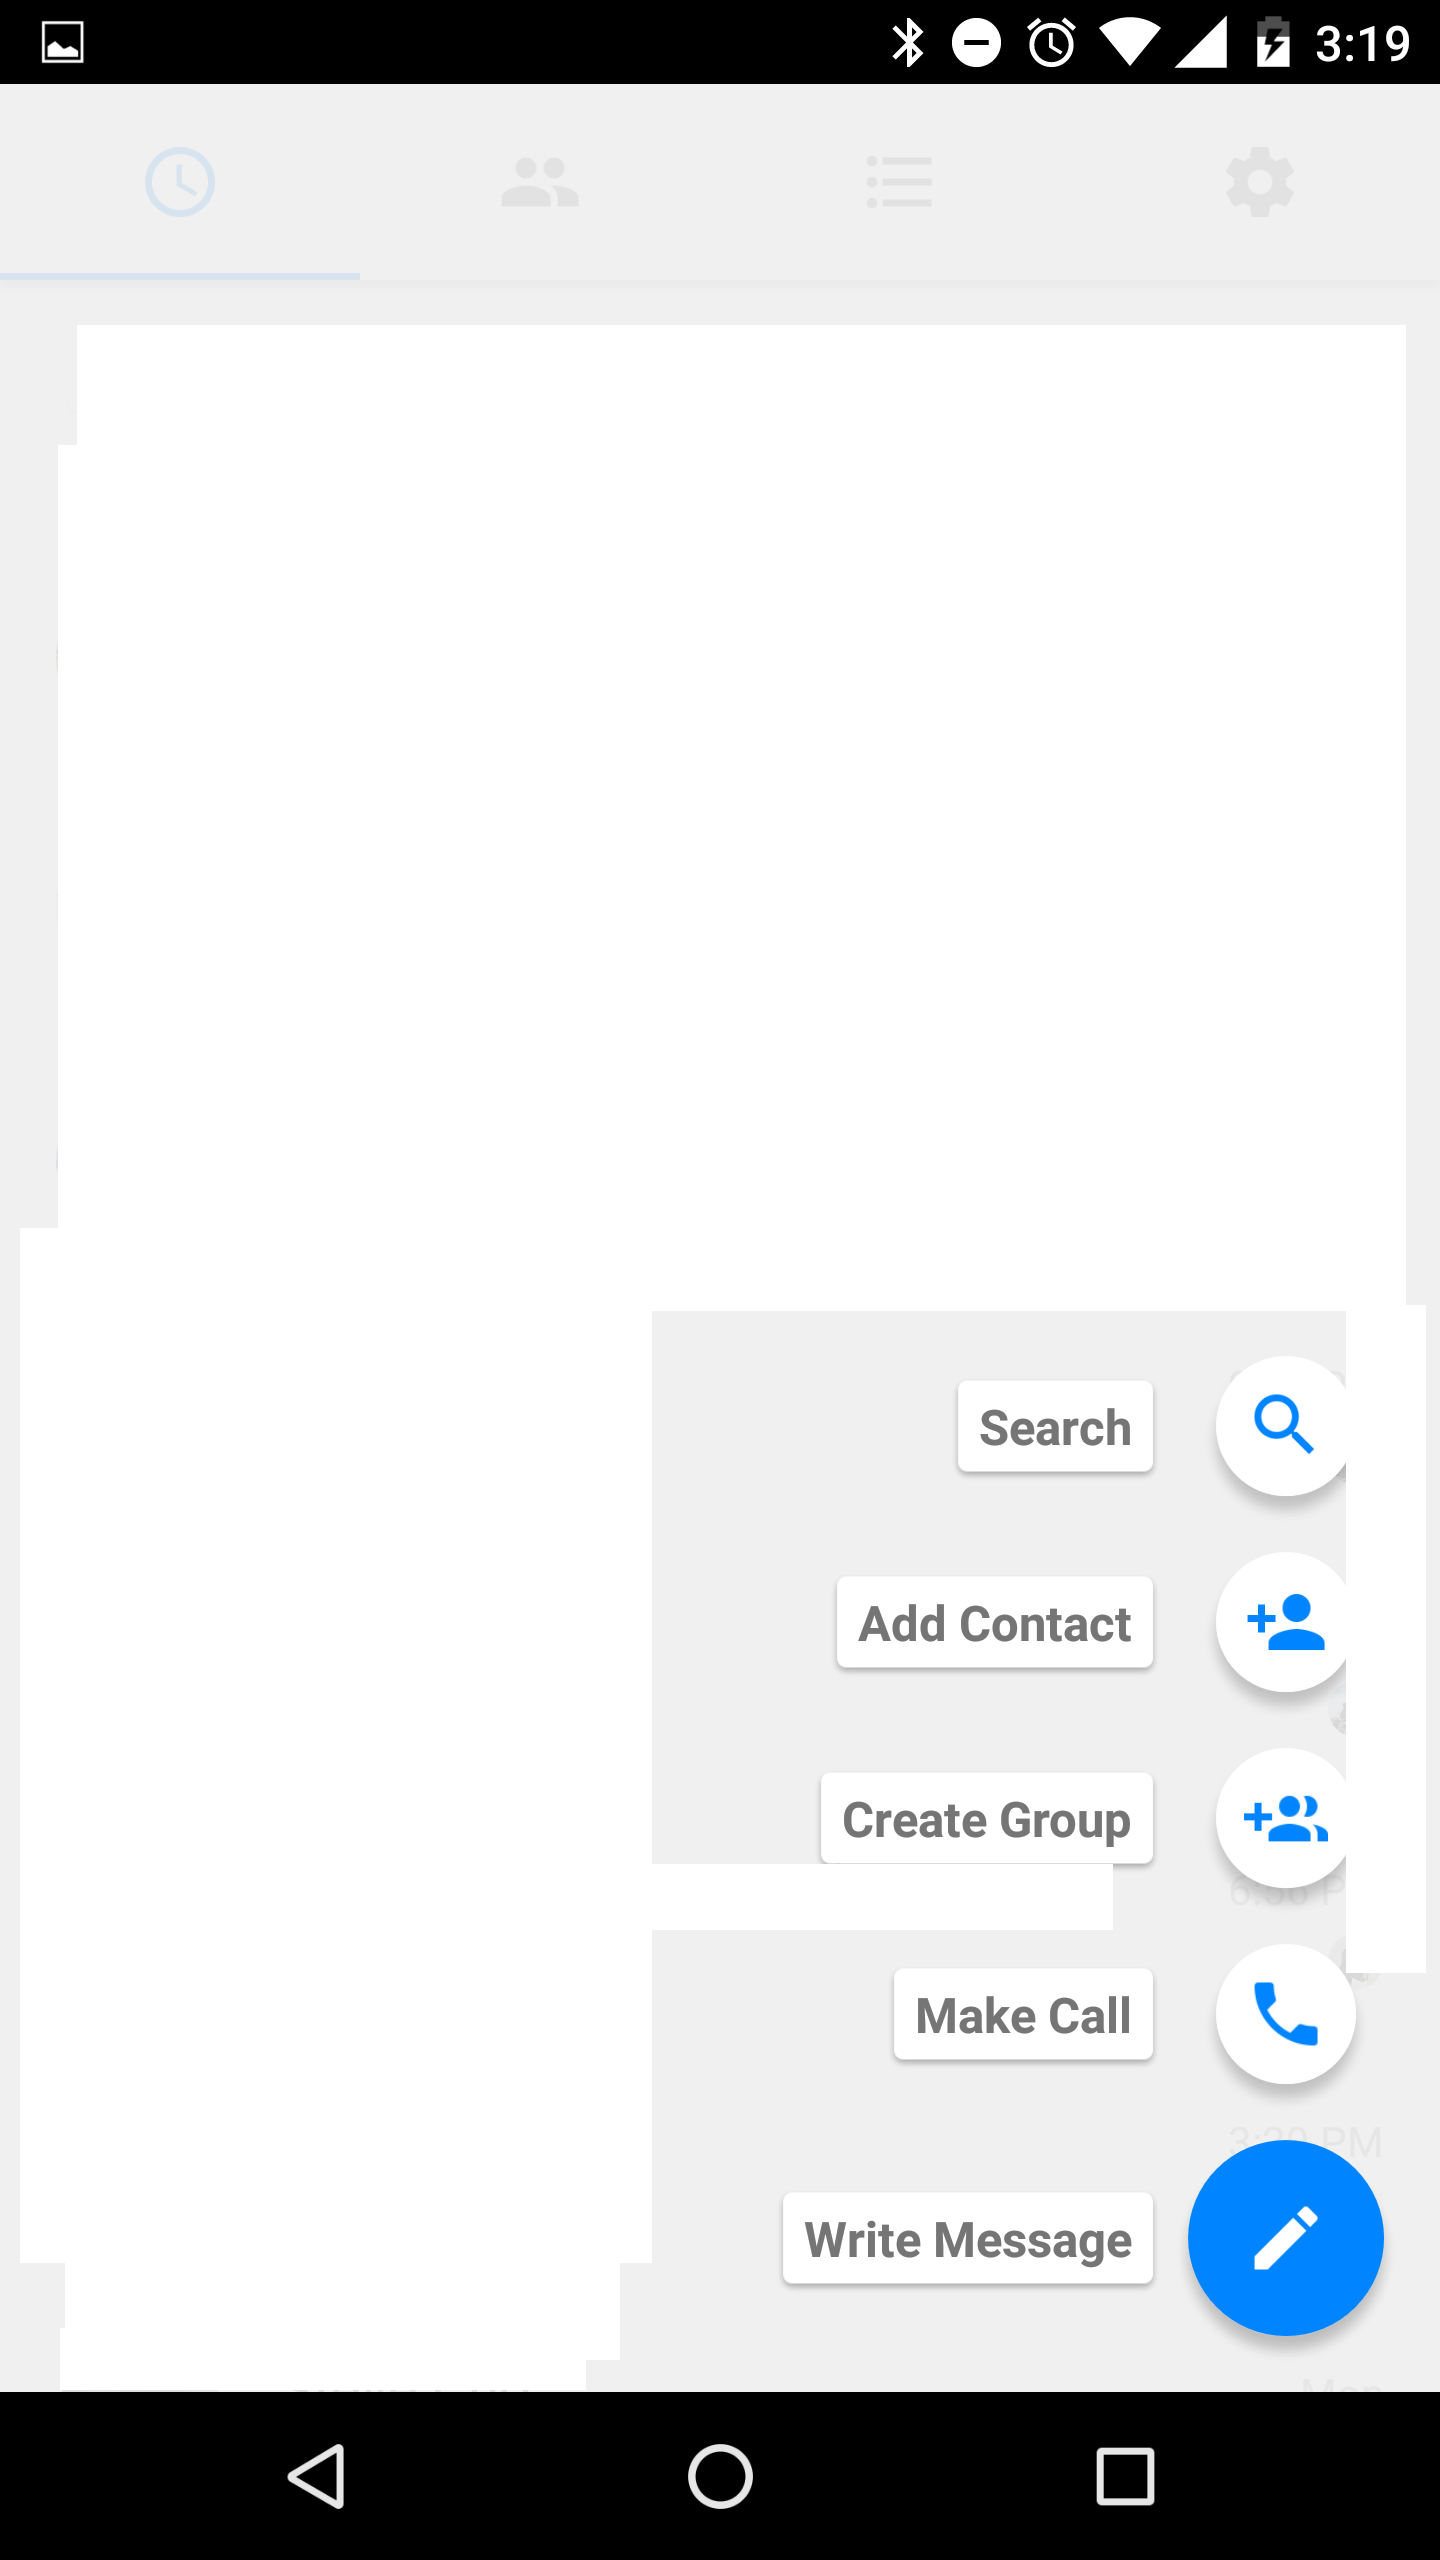 Facebook Messenger FAB Material Design 2